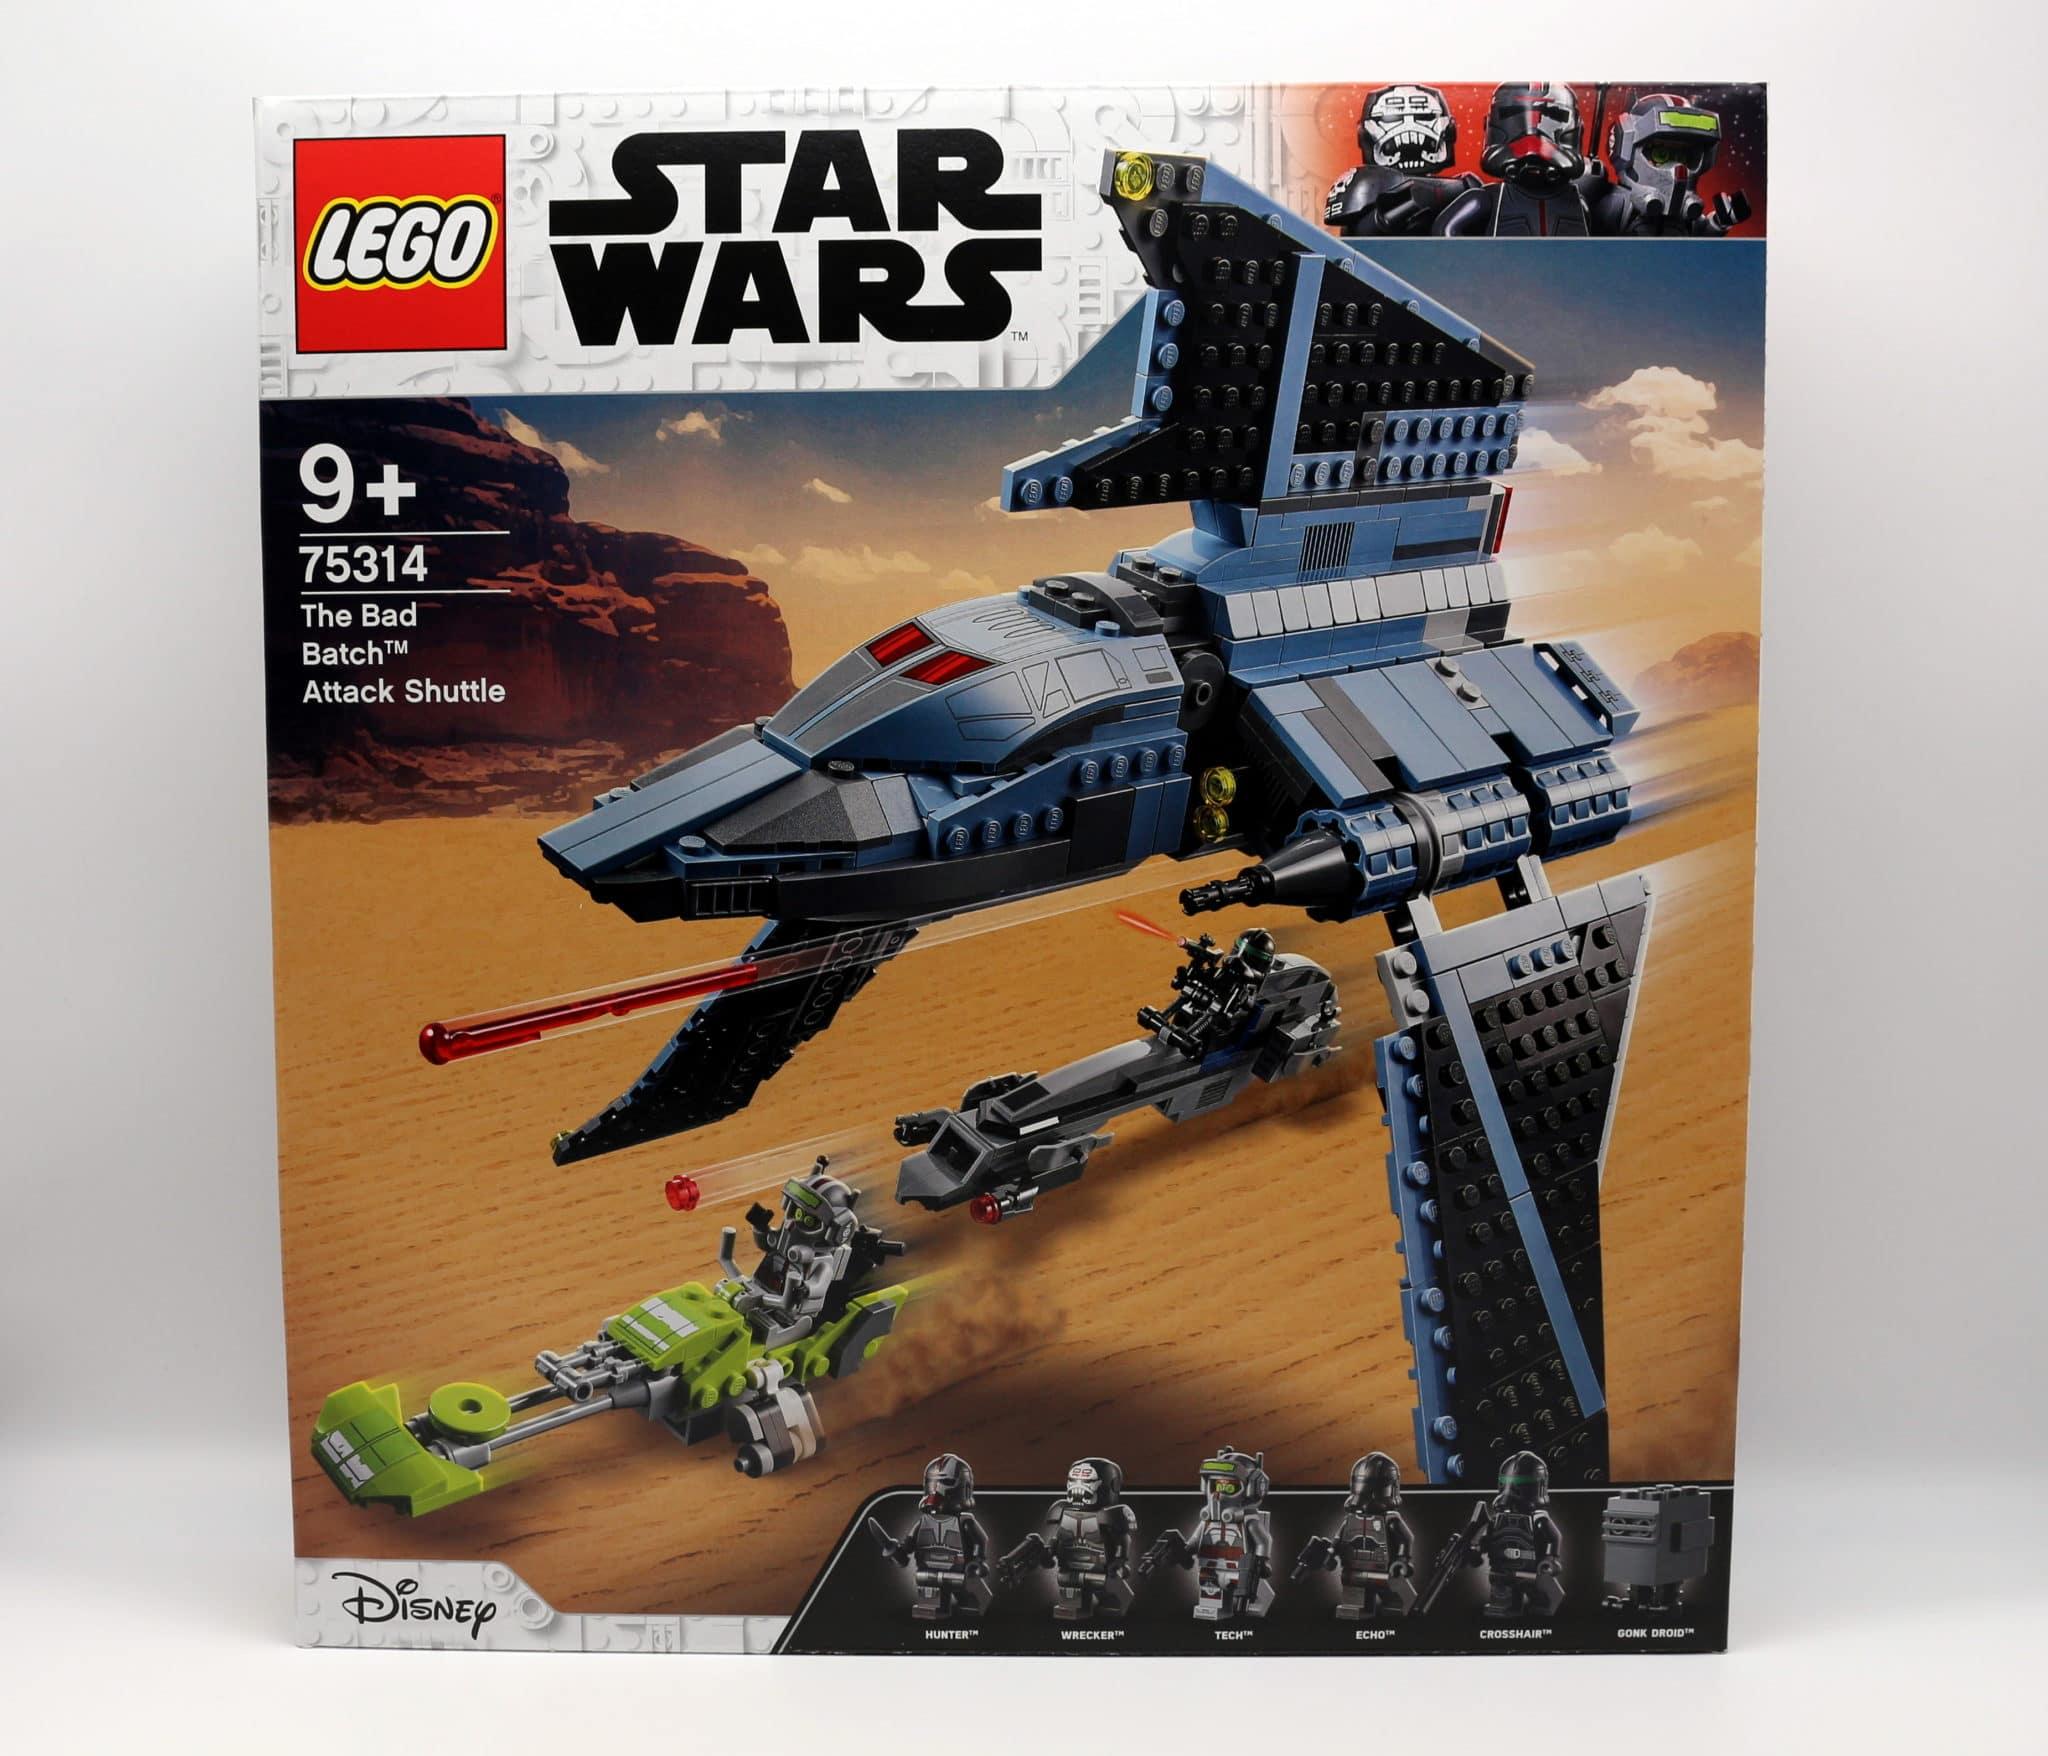 LEGO Star Wars 75314 The Bad Batch Attack Shuttle Box Front.JPG